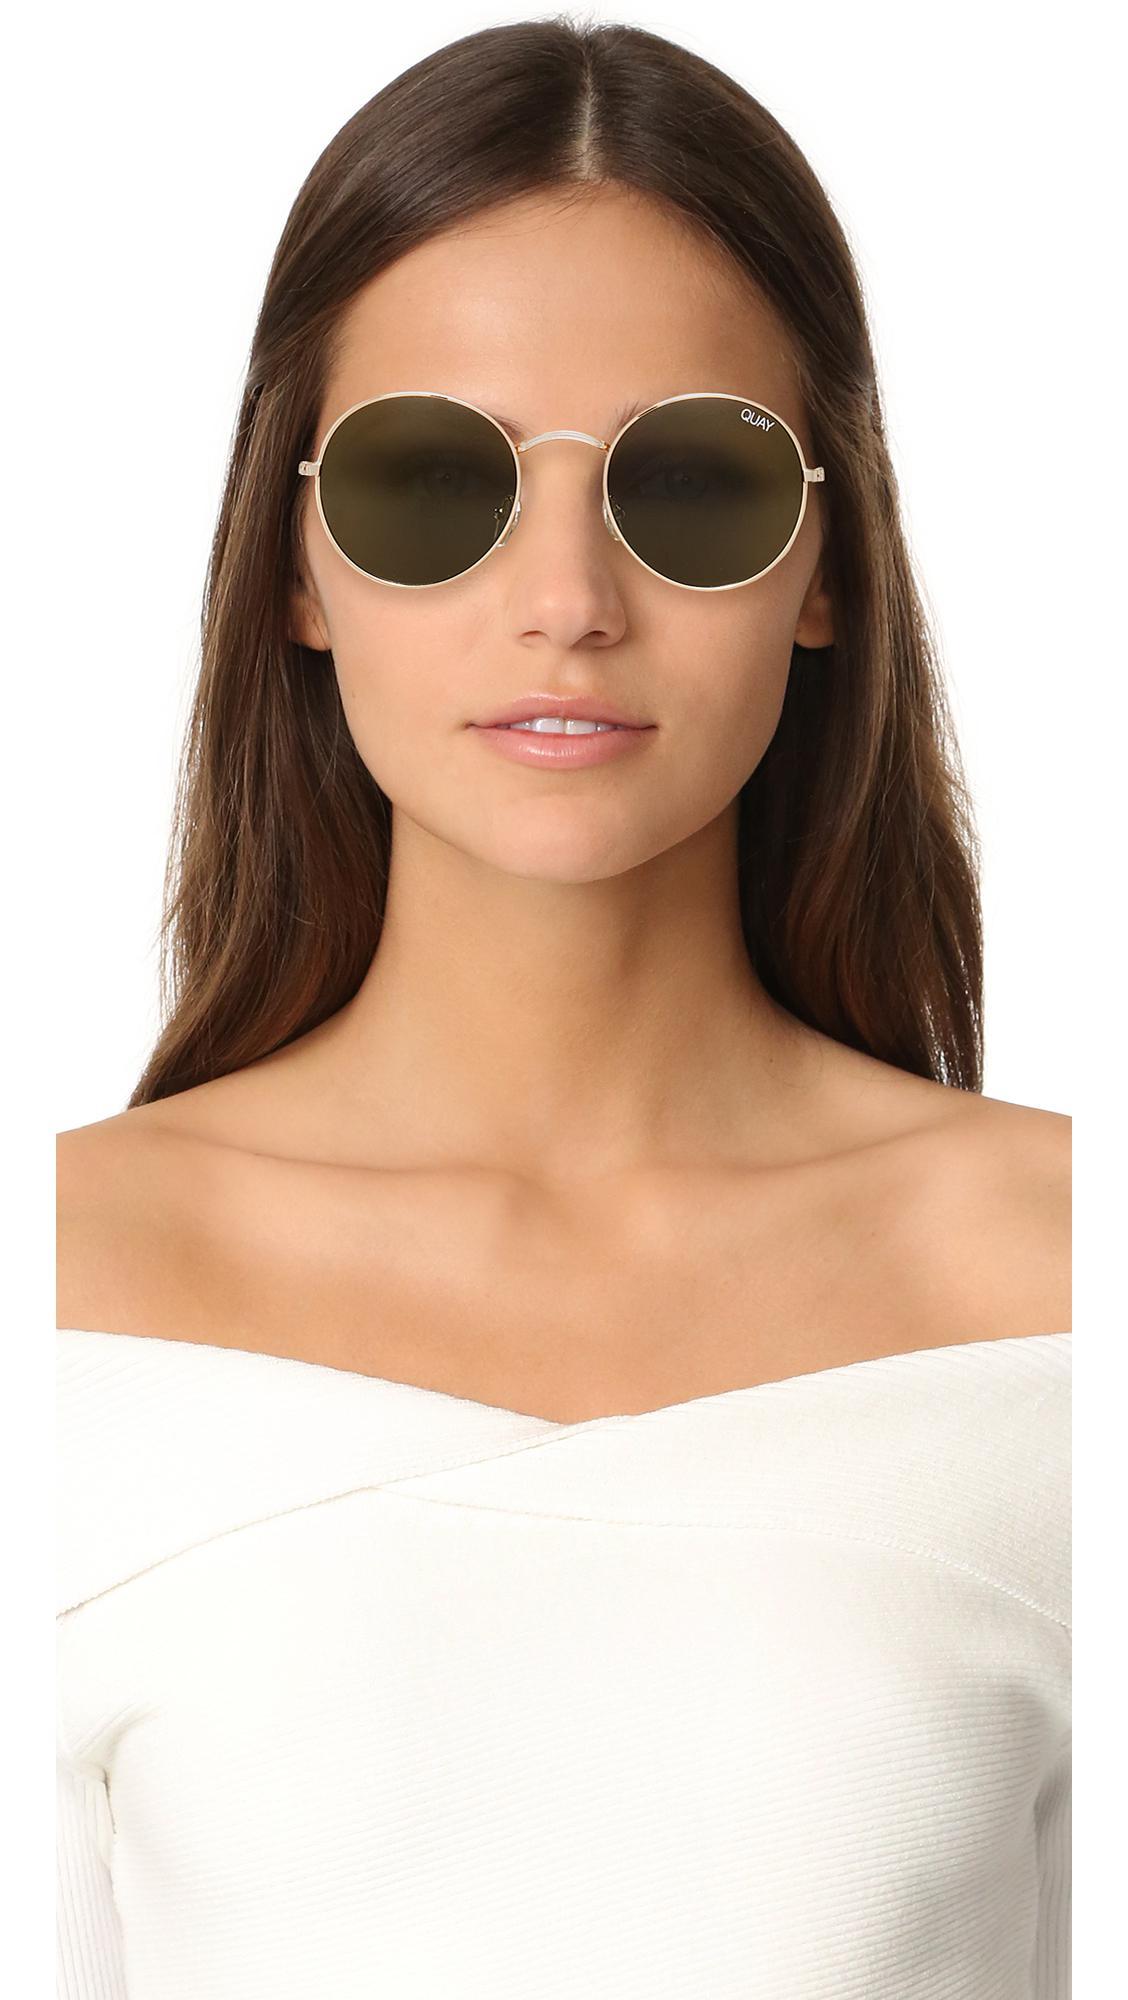 c6982bce9966c Quay - Green Mod Star Sunglasses - Lyst. View fullscreen